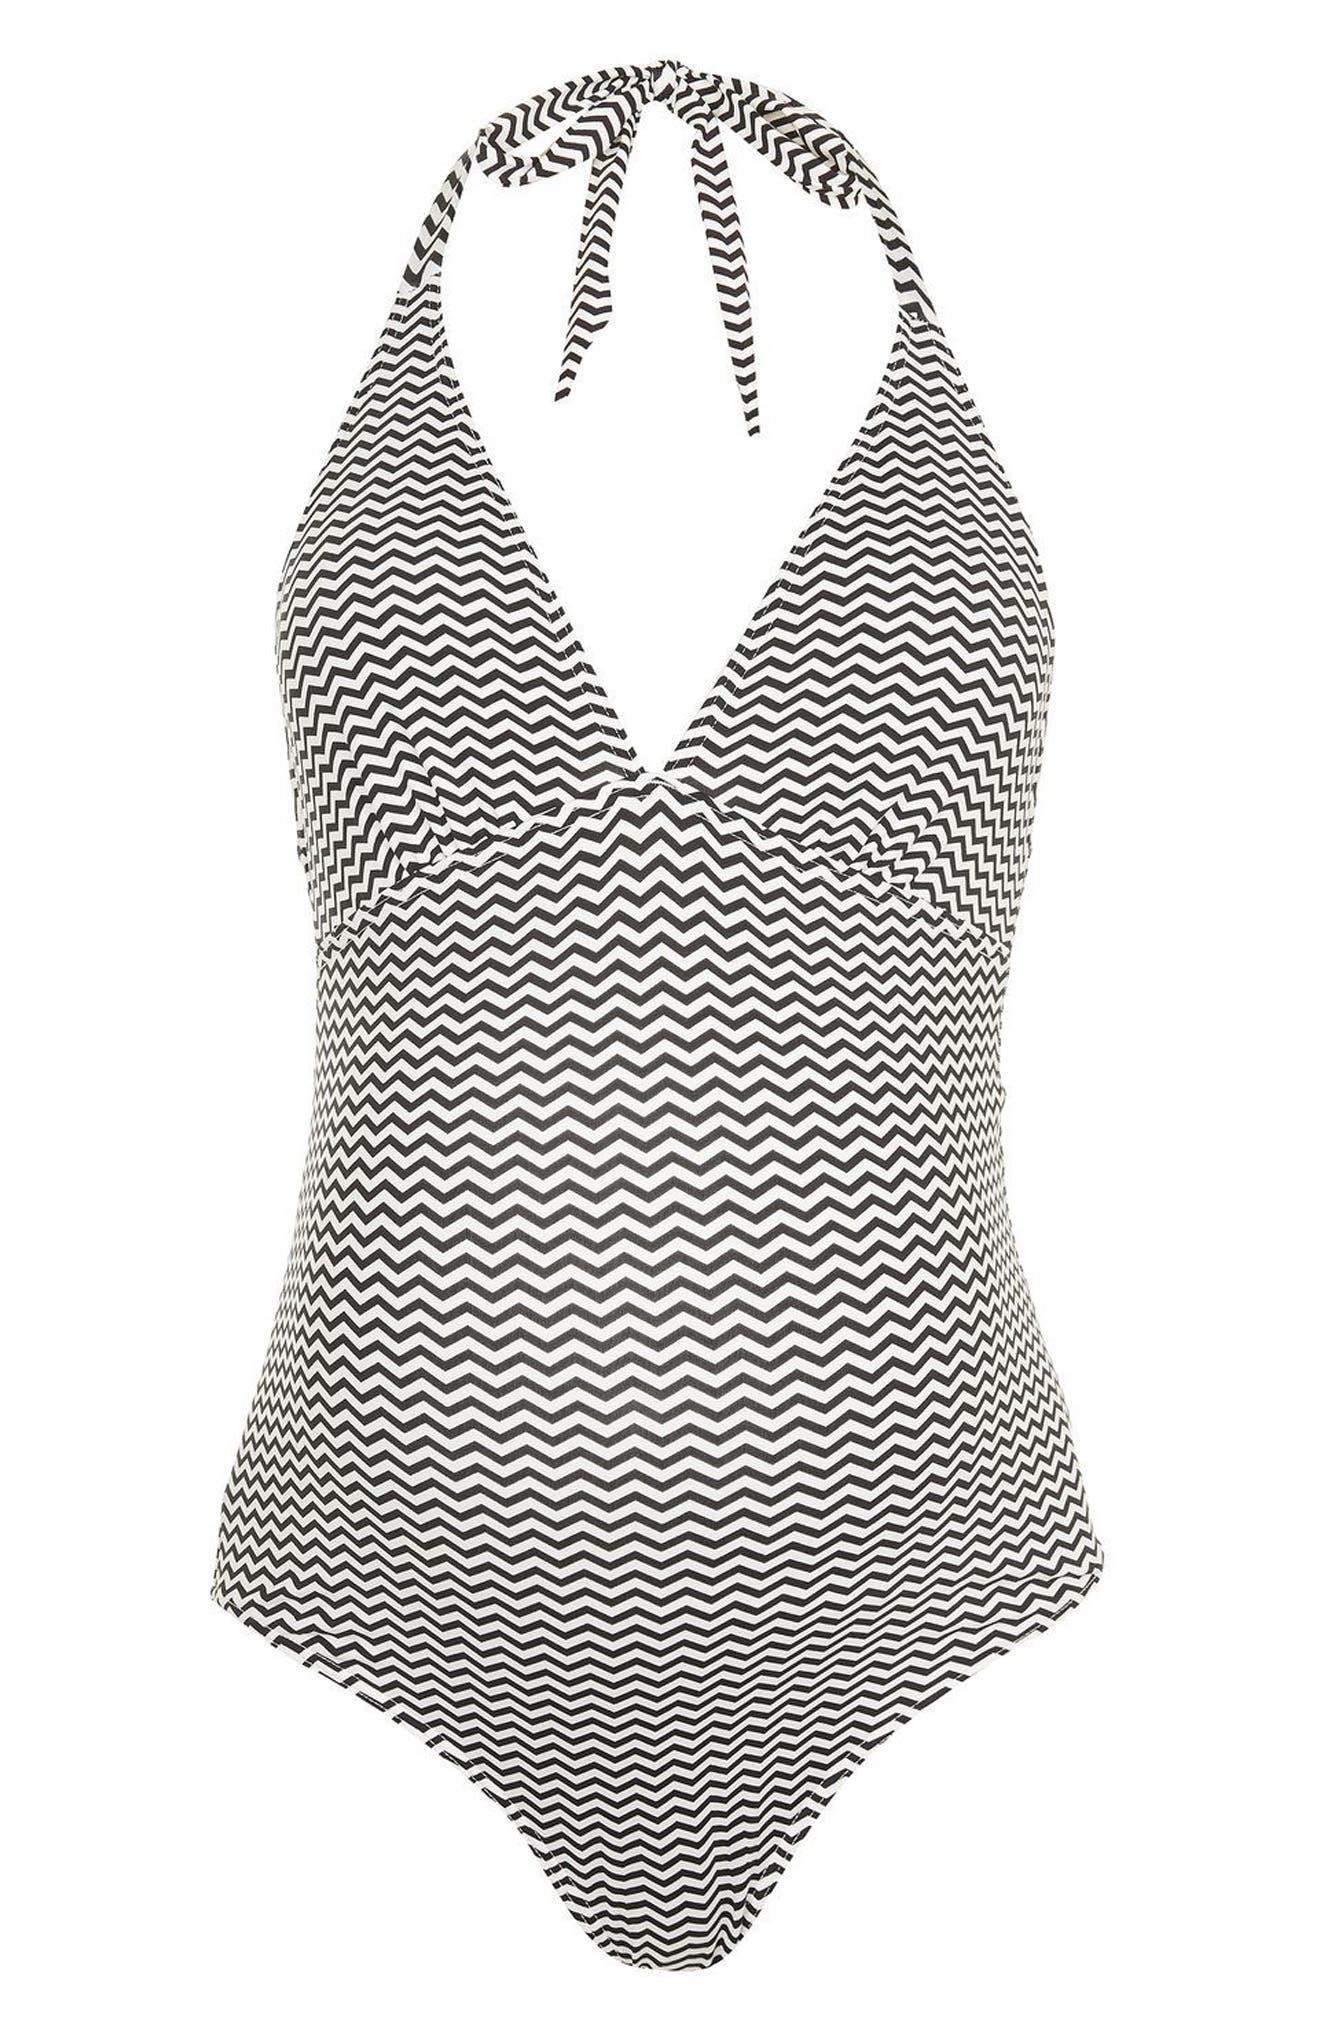 Topshop Zigzag Halter One-Piece Maternity Swimsuit